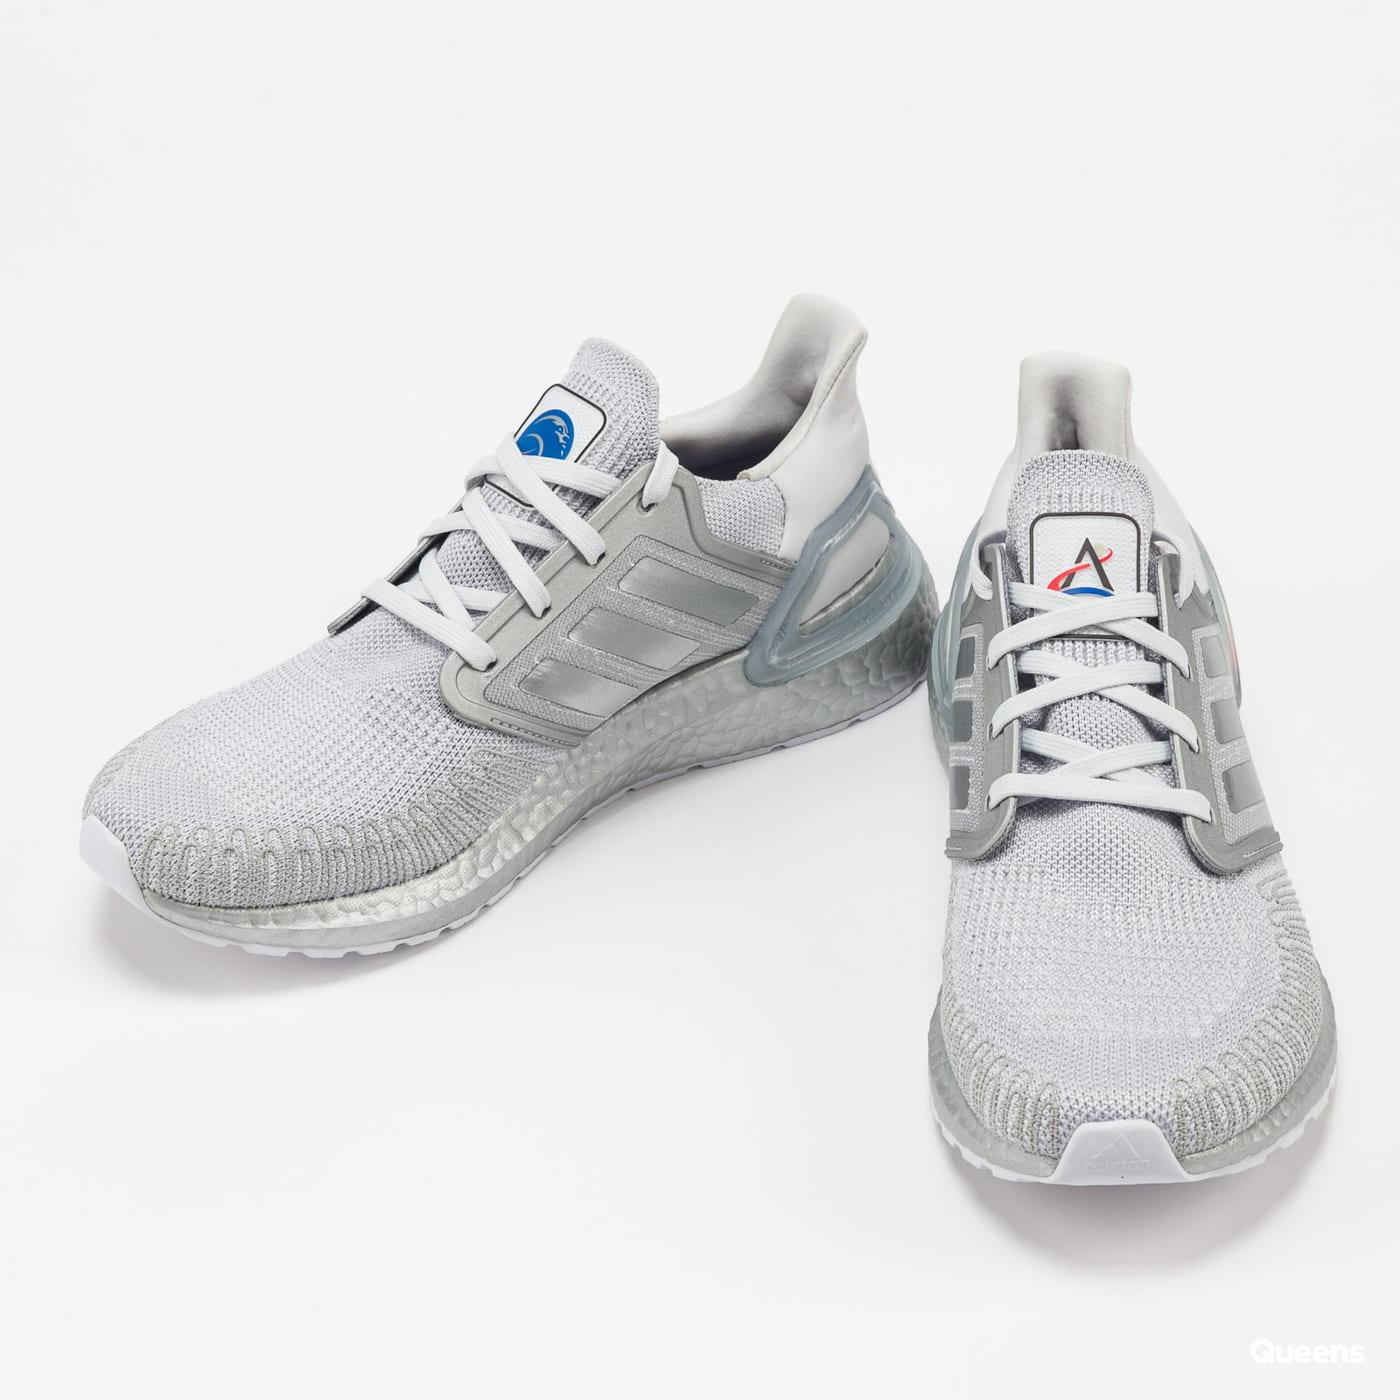 adidas Performance UltraBoost 20 DNA dasgre / silvmt / halsilv